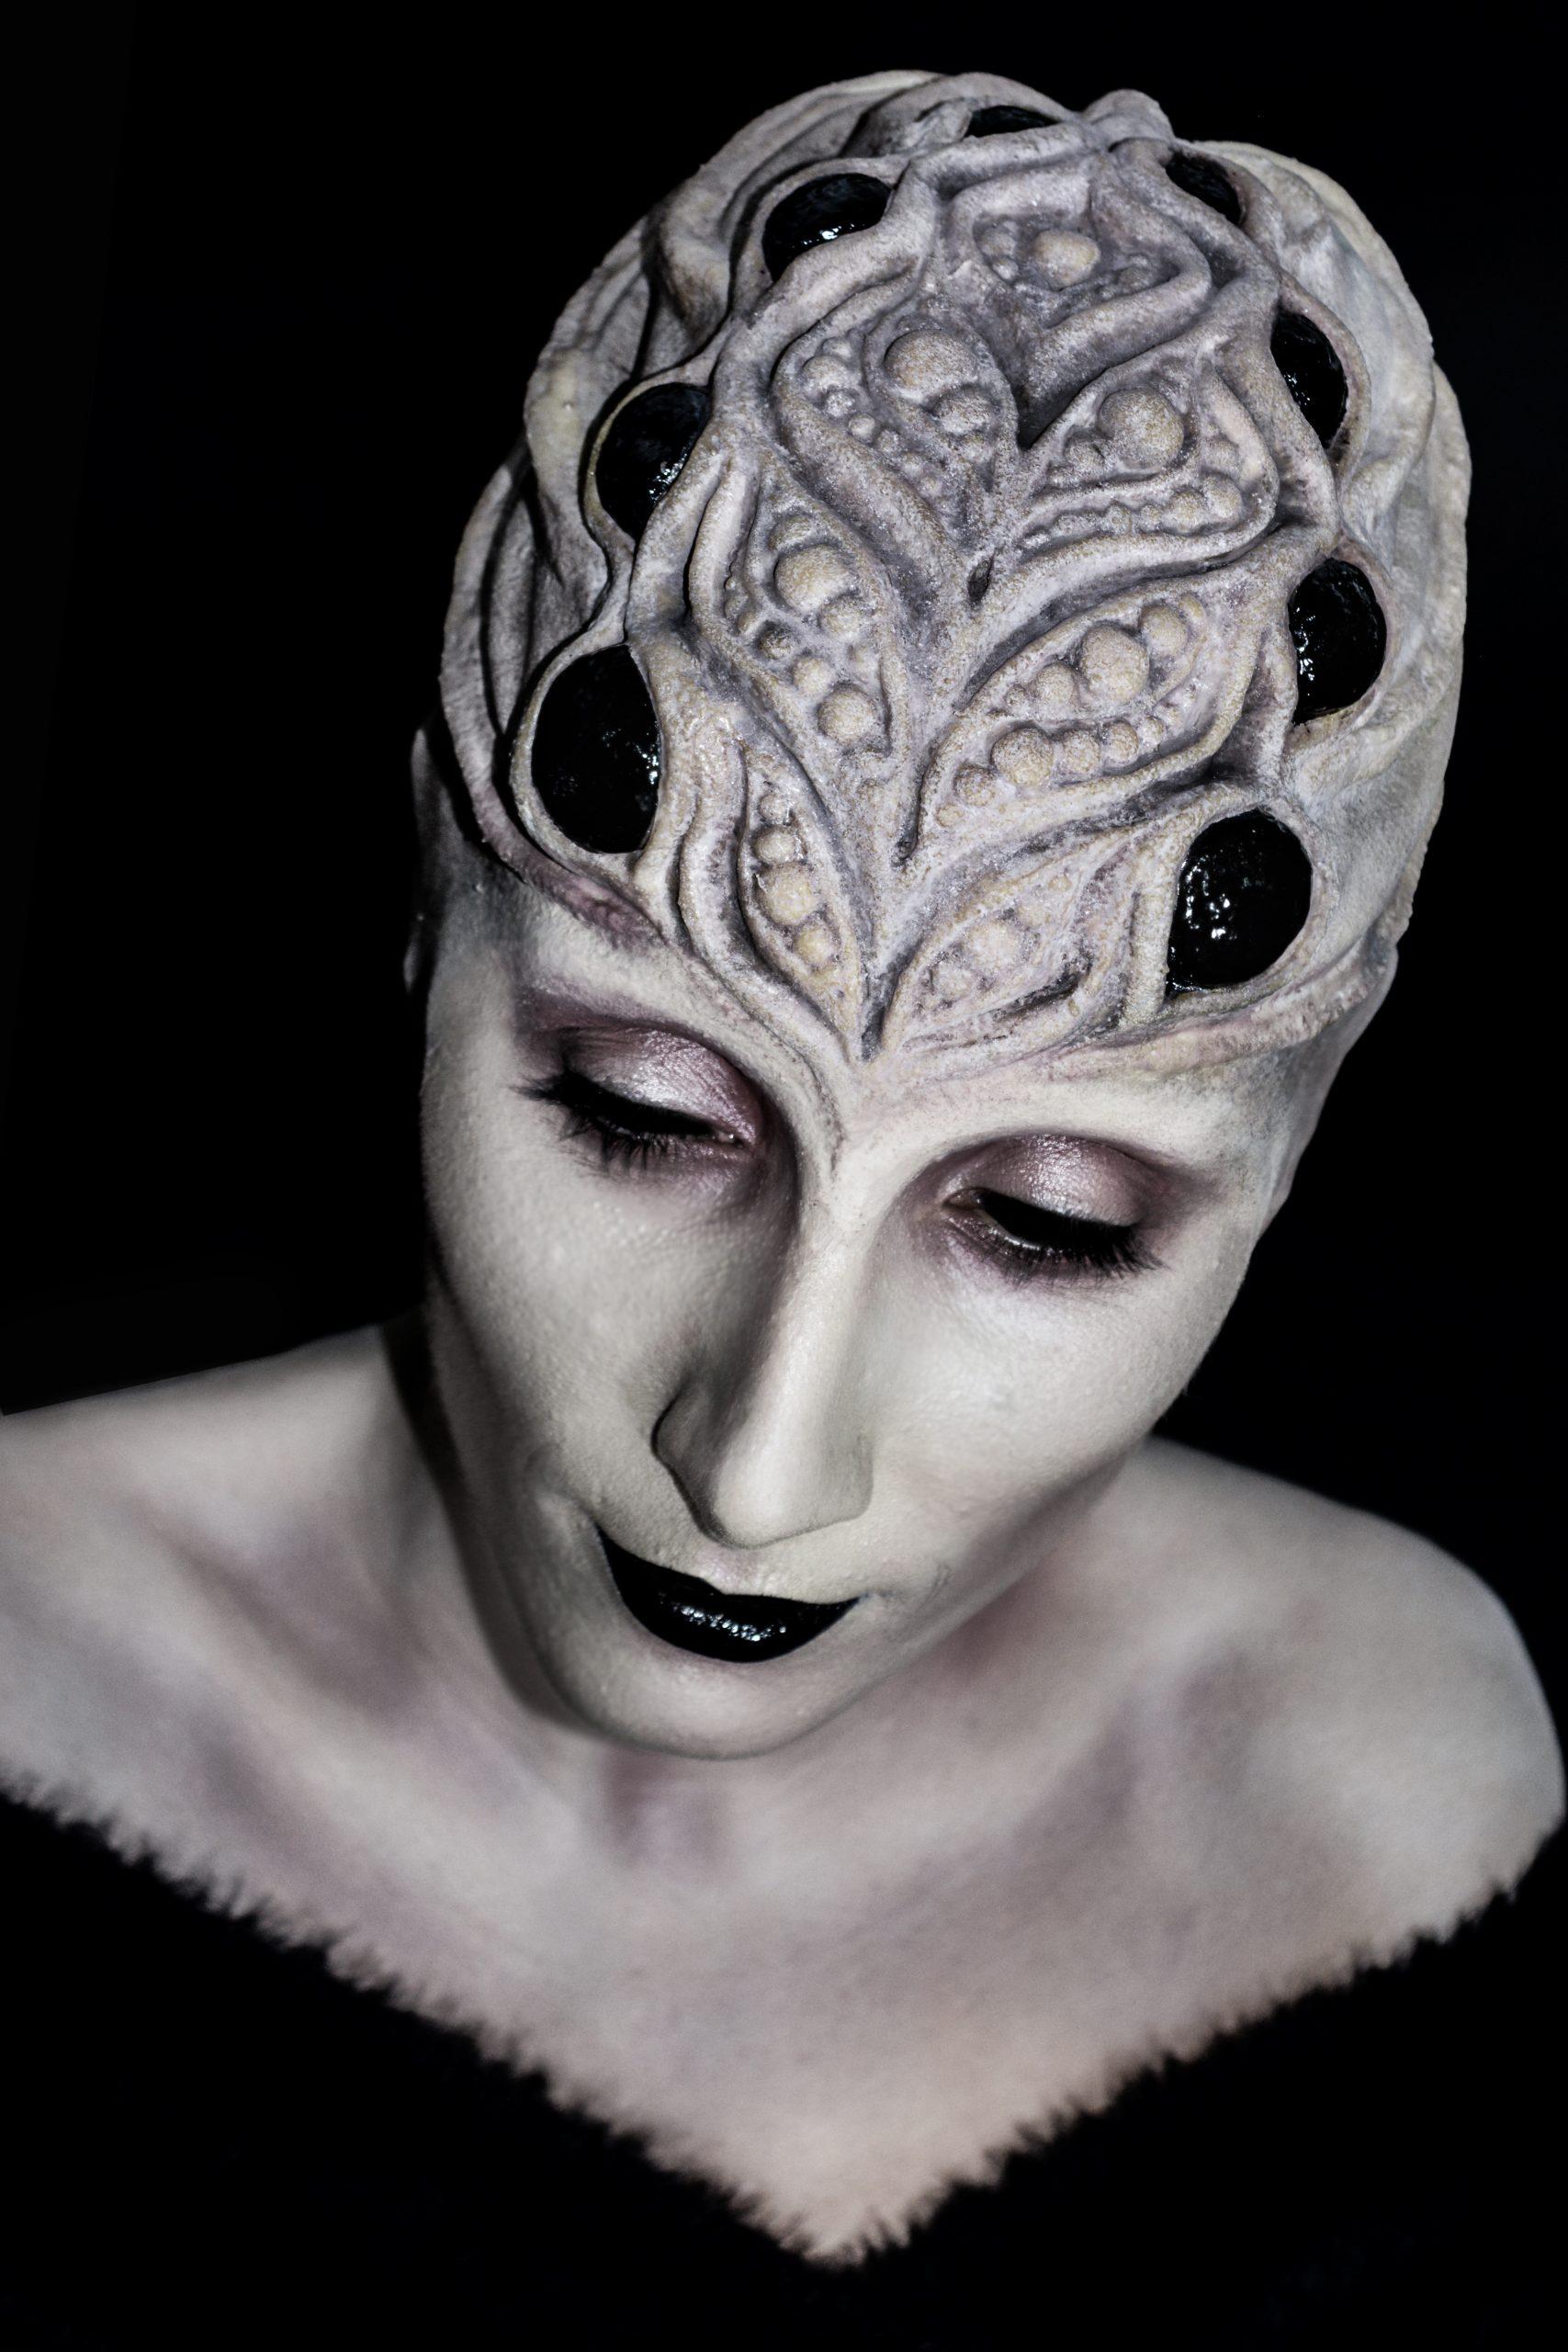 Alien, lattex prostetic special effects professional makeup